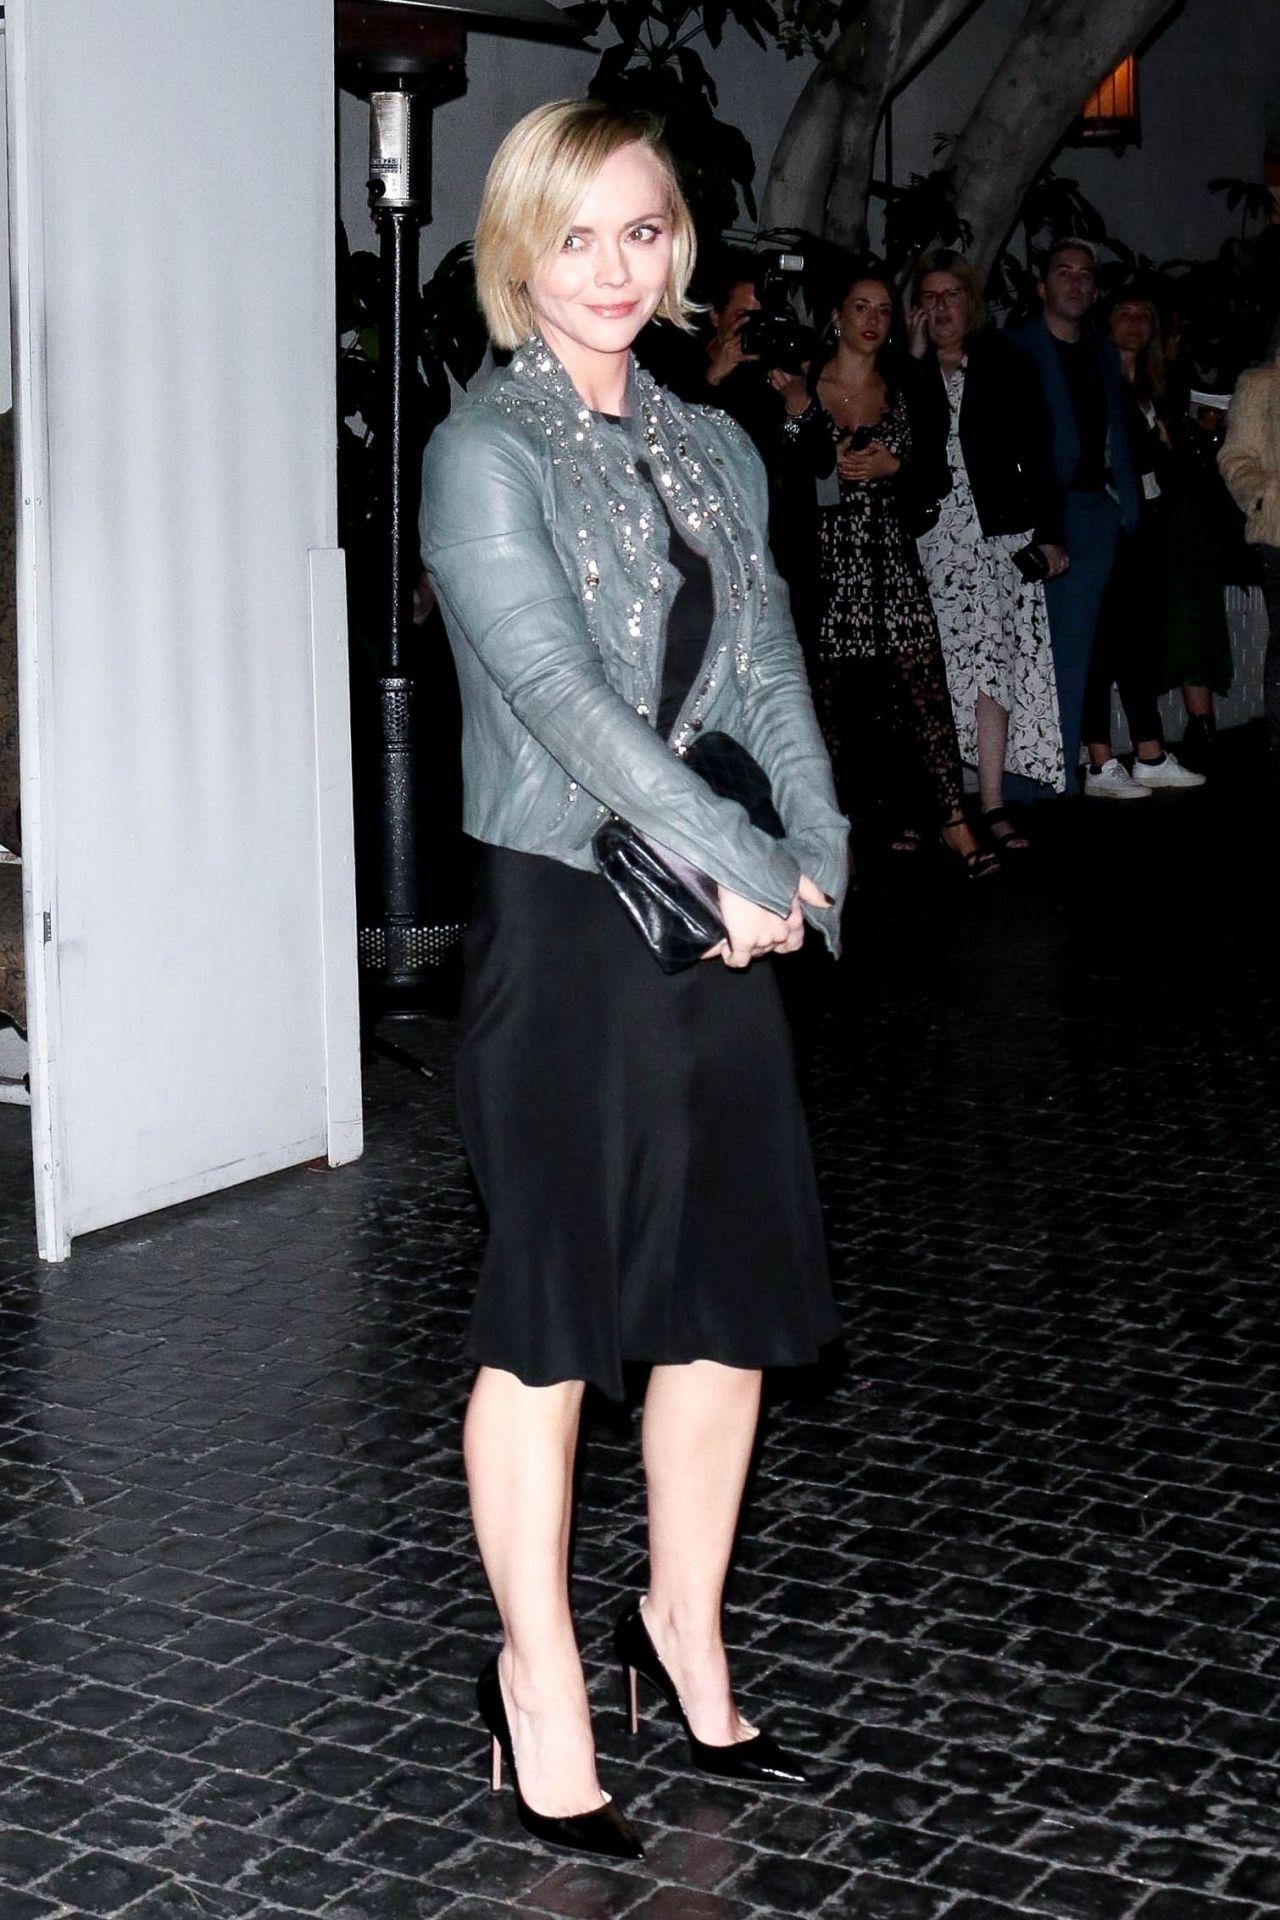 https://celebmafia.com/wp-content/uploads/2019/01/christina-ricci-outside-w-magazine-celebrates-its-best-performances-portfolio-party-in-la-01-04-2019-2.jpg